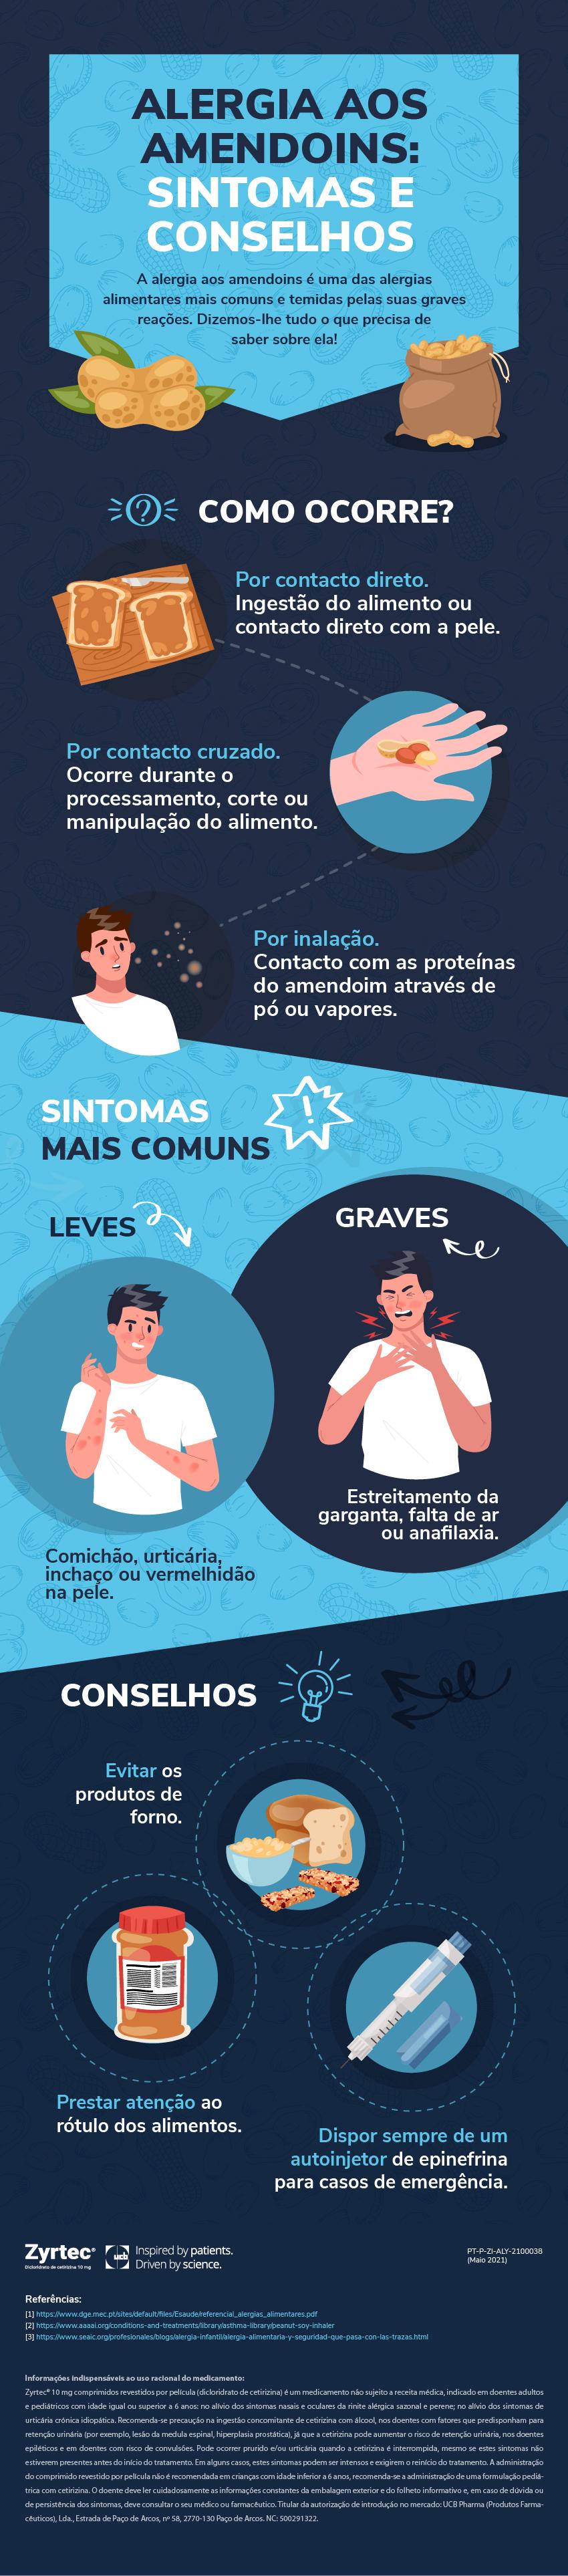 alergia aos amendoins sintomas e conselhos